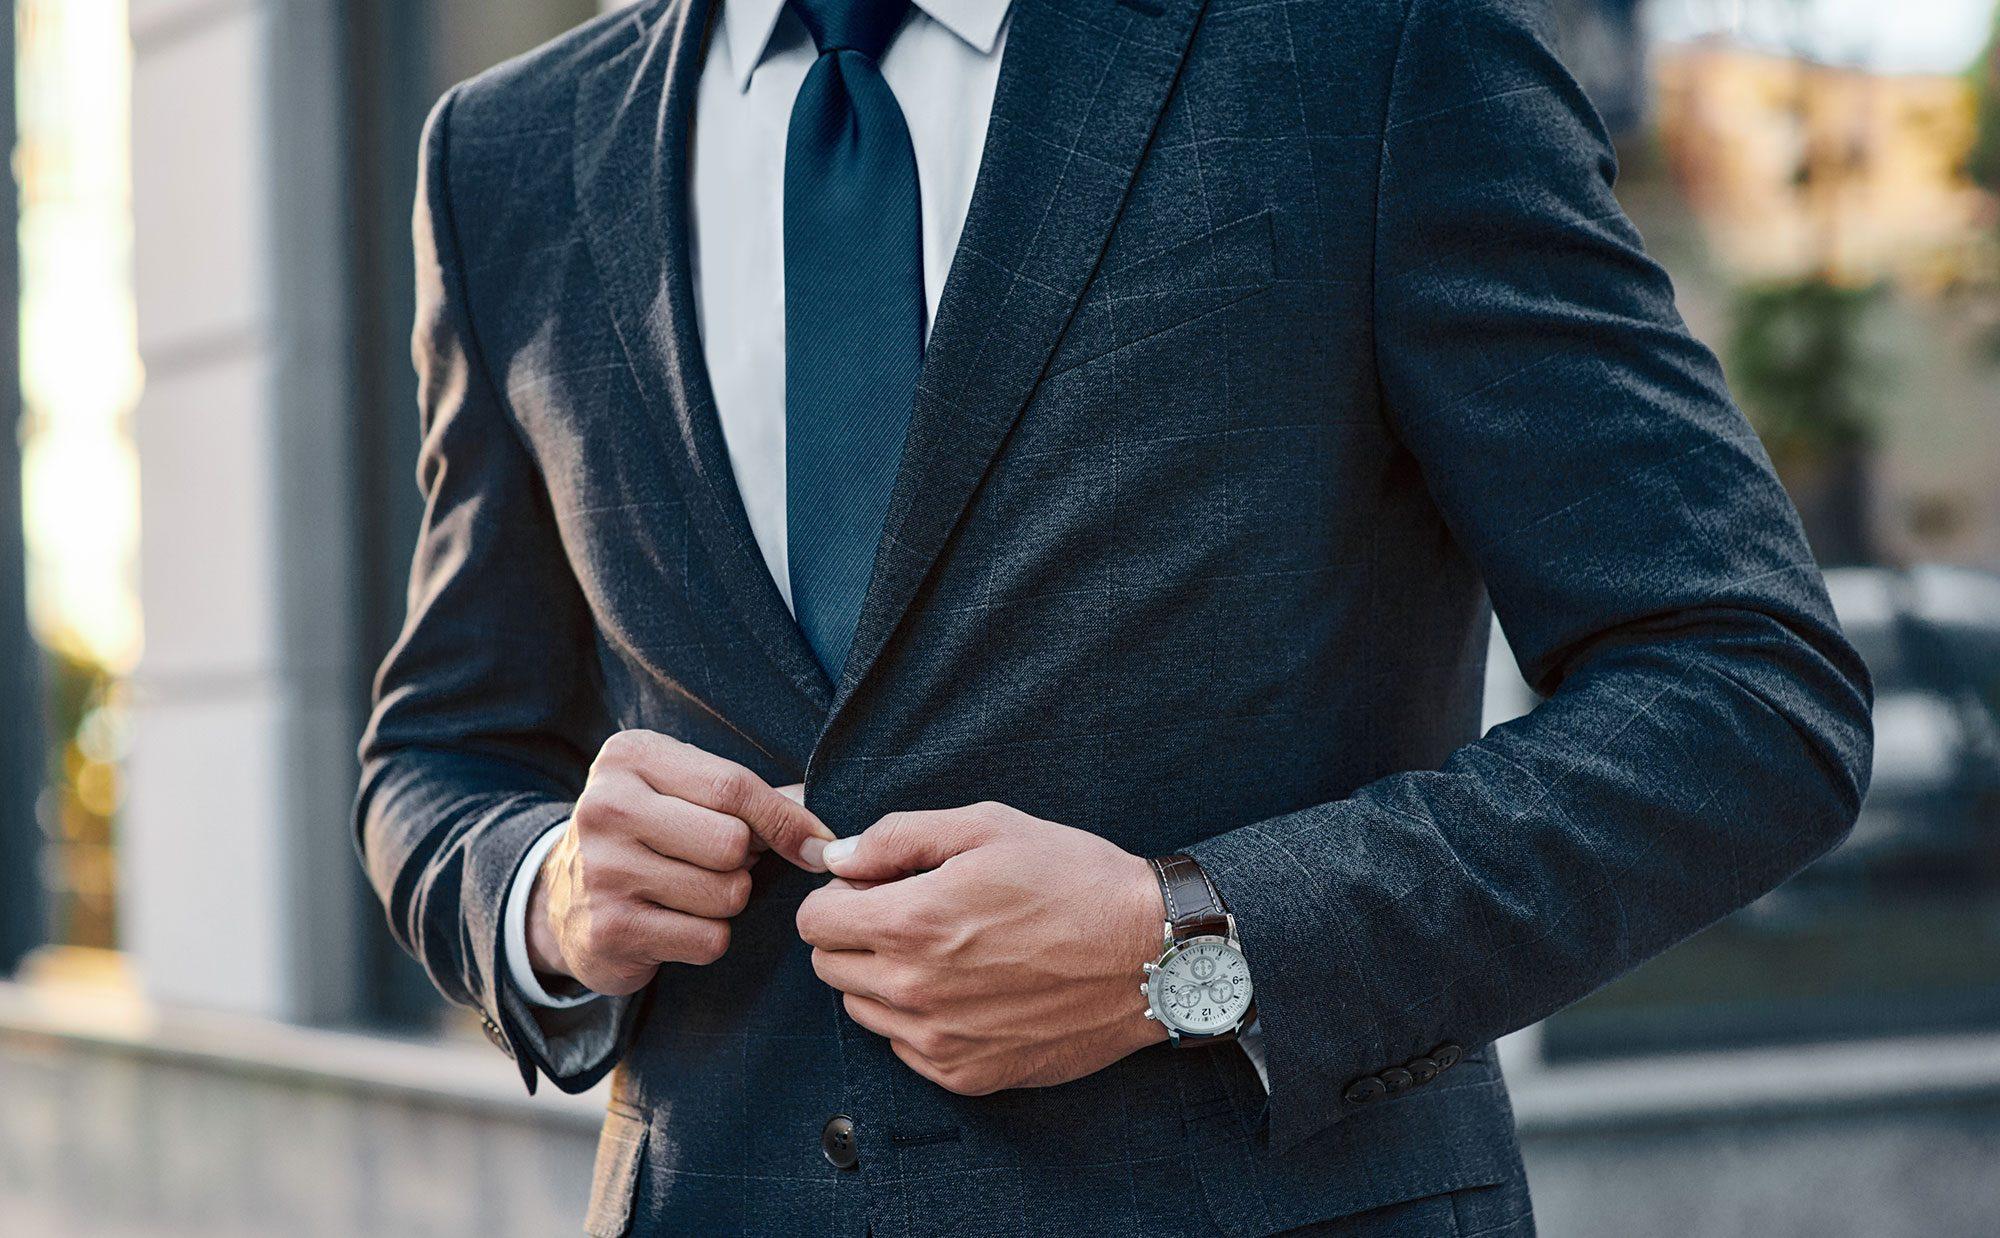 bd36a27ee797e9 大人スーツの着こなし術 おしゃれなビジネスマンの暮らし【暮らし方から物件探し | HOME'S】